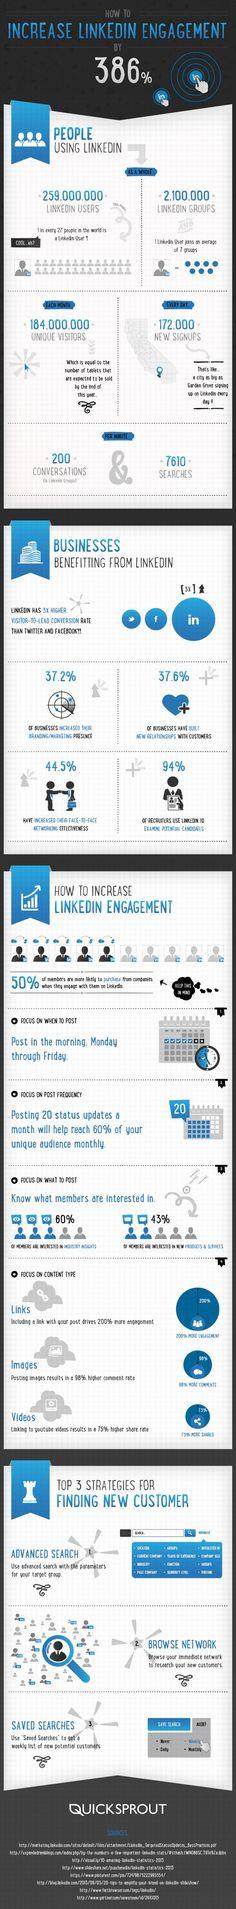 Engagement sur #Linkedin et potentiels d'exploitation / How to increase LinkedIn engagement #Infographie